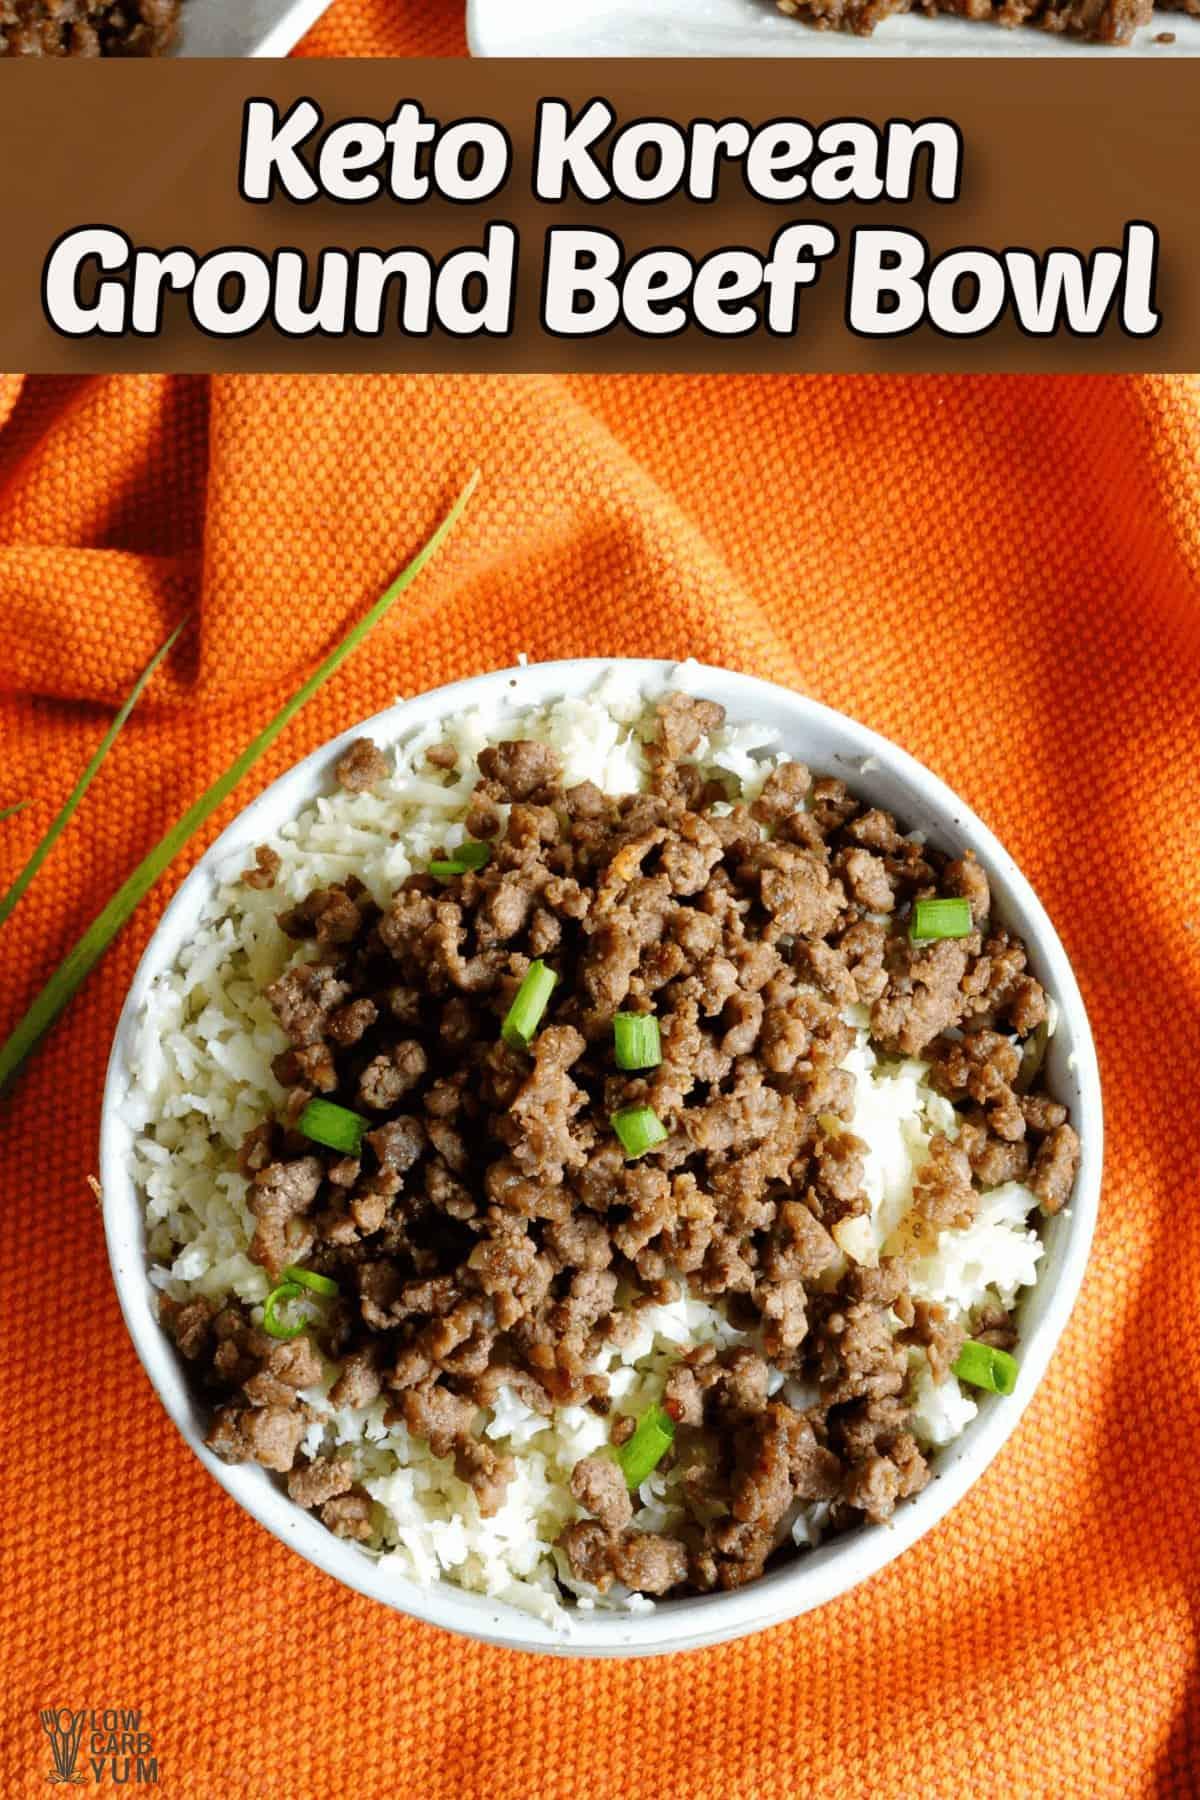 keto korean ground beef bowl pintrest image